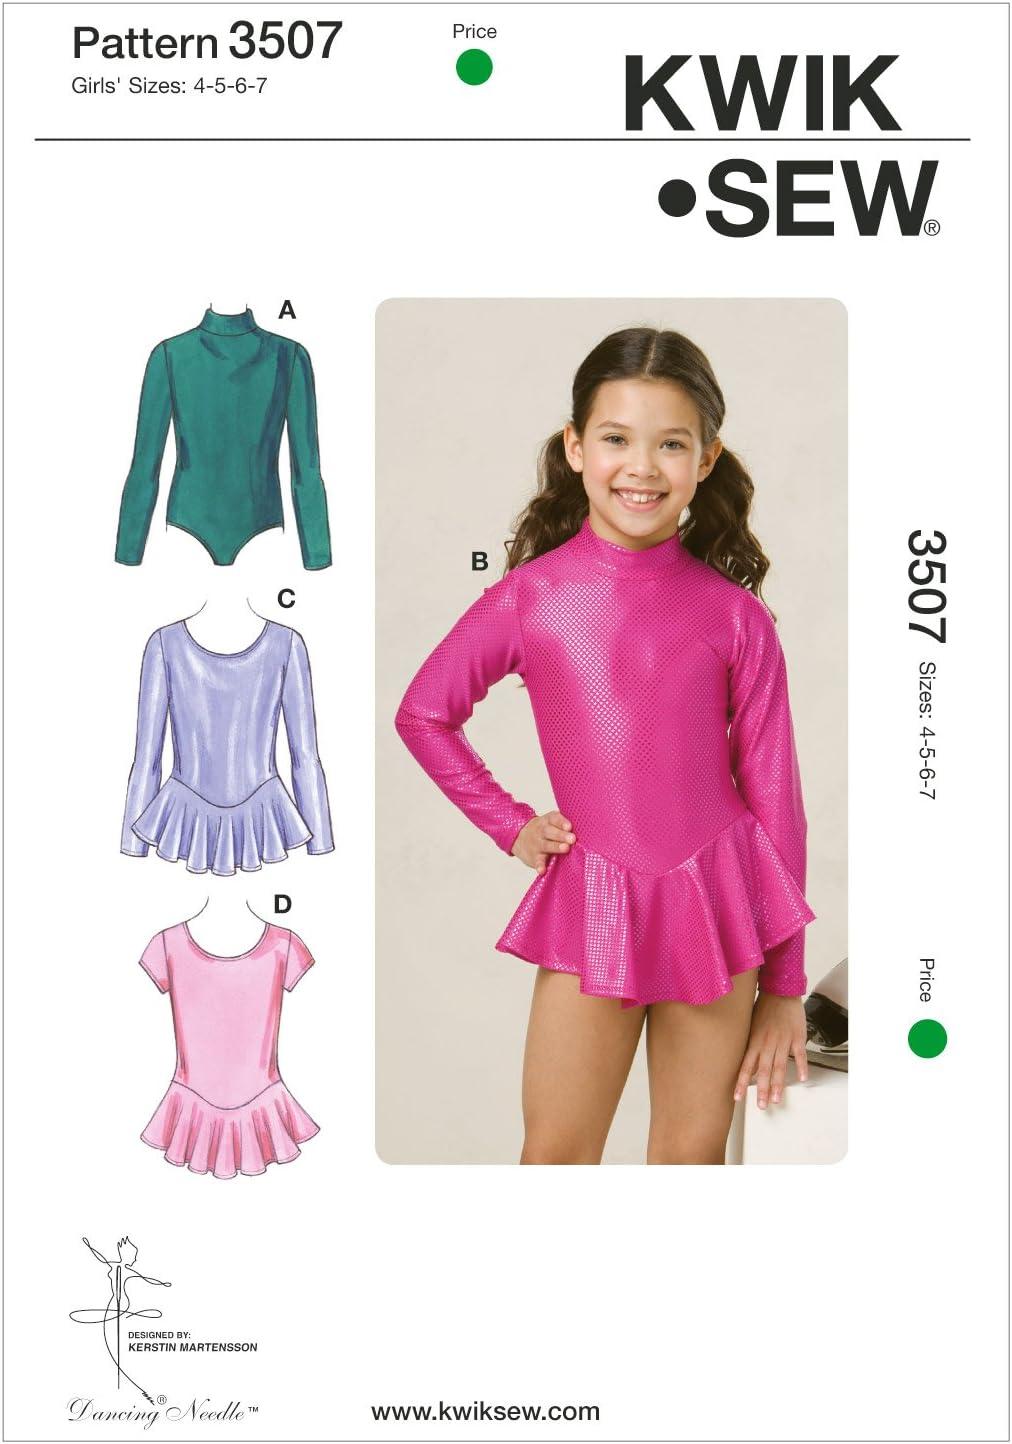 Kwik Sew K3507 Leotards Sewing Pattern, Size 4-5-6-7